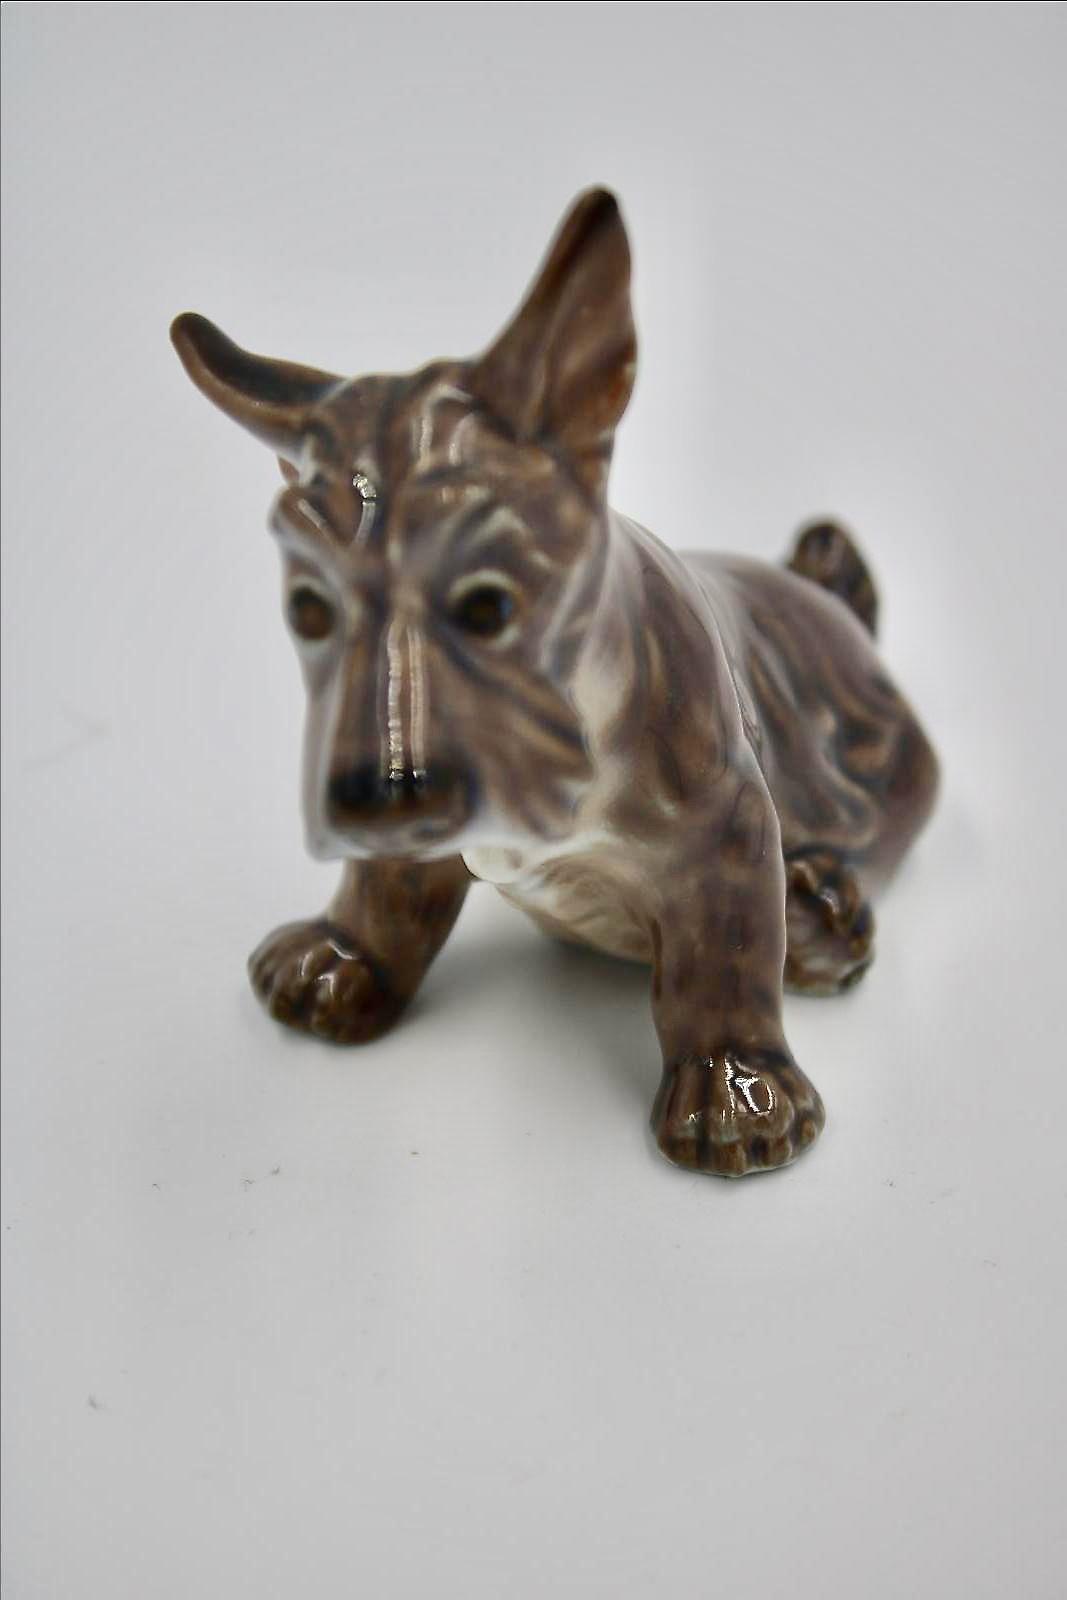 Dahl Jensen SCOTTISH TERRIER Dog Large Scottie Figurine No 1066 Denmark Porcelain 1st Quality Vintage